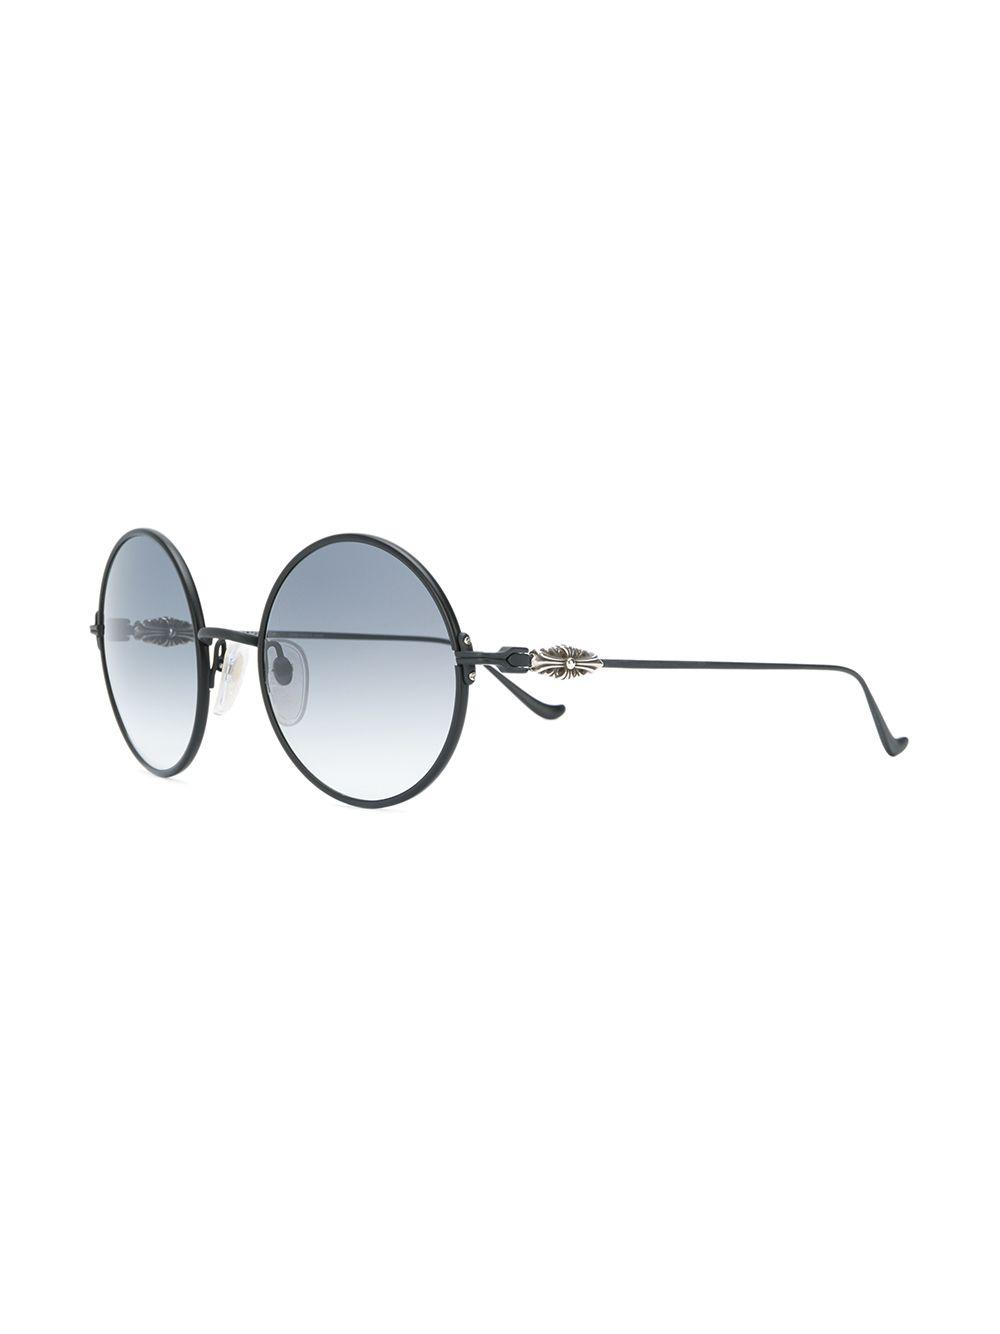 b78873dac44e Chrome Hearts Ovaryeasy Sunglasses in Black - Lyst